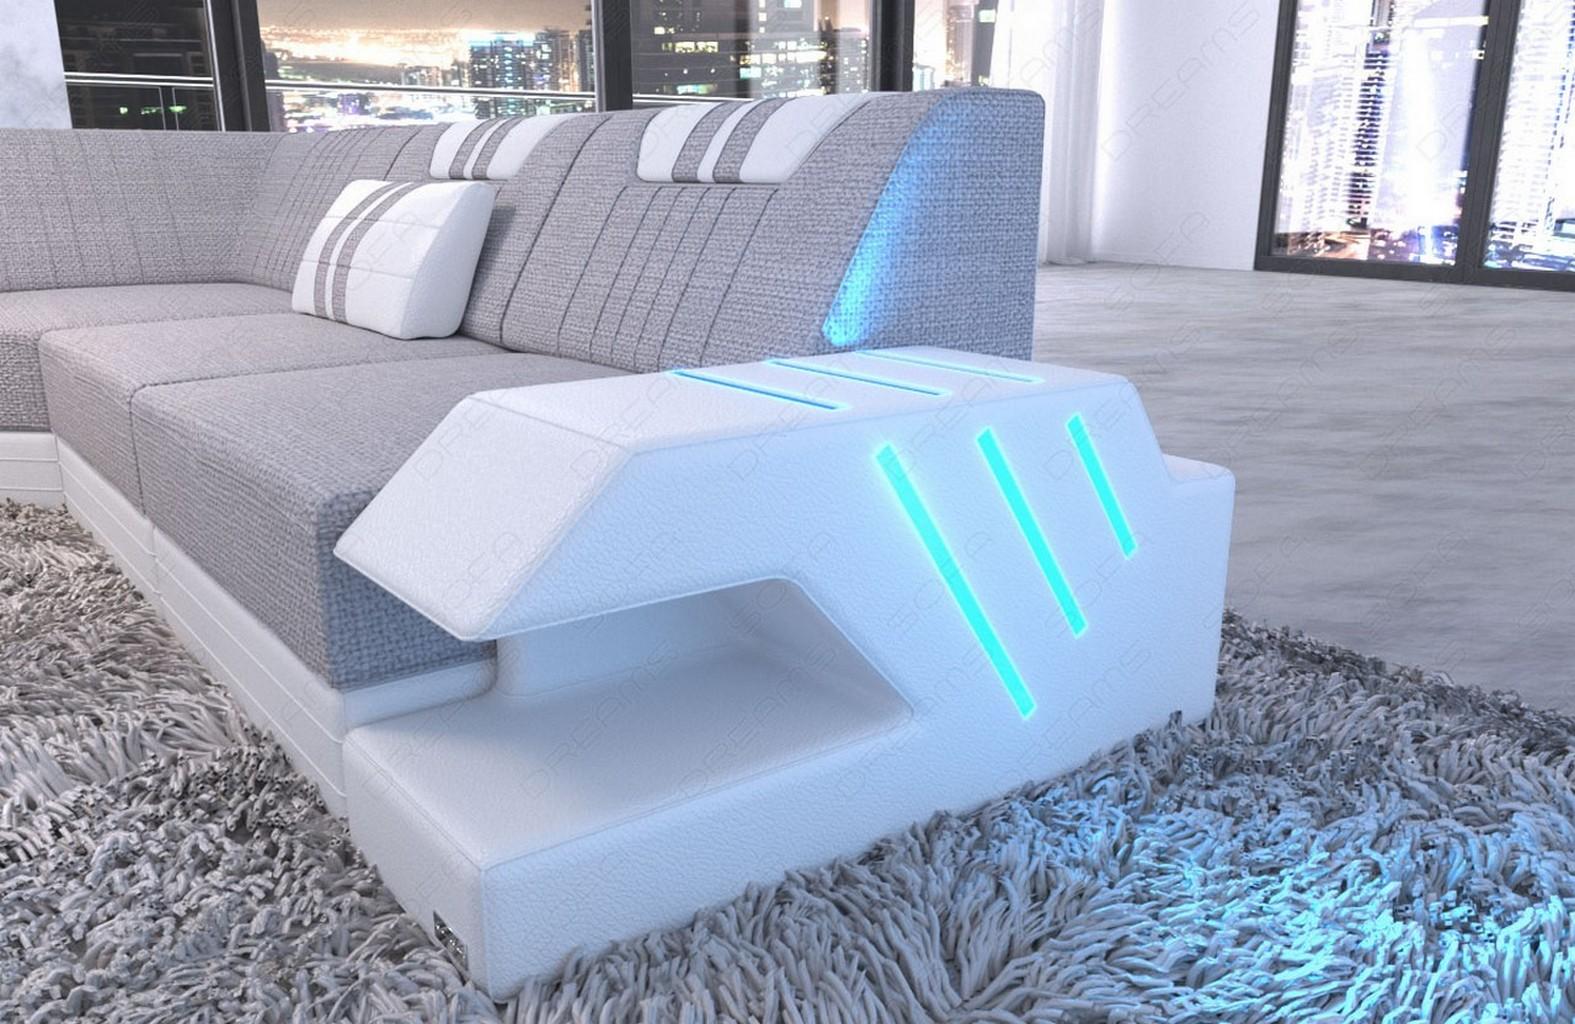 polster wohnlandschaft sofa couch venedig xxl recamiere led usb macchiato ebay. Black Bedroom Furniture Sets. Home Design Ideas